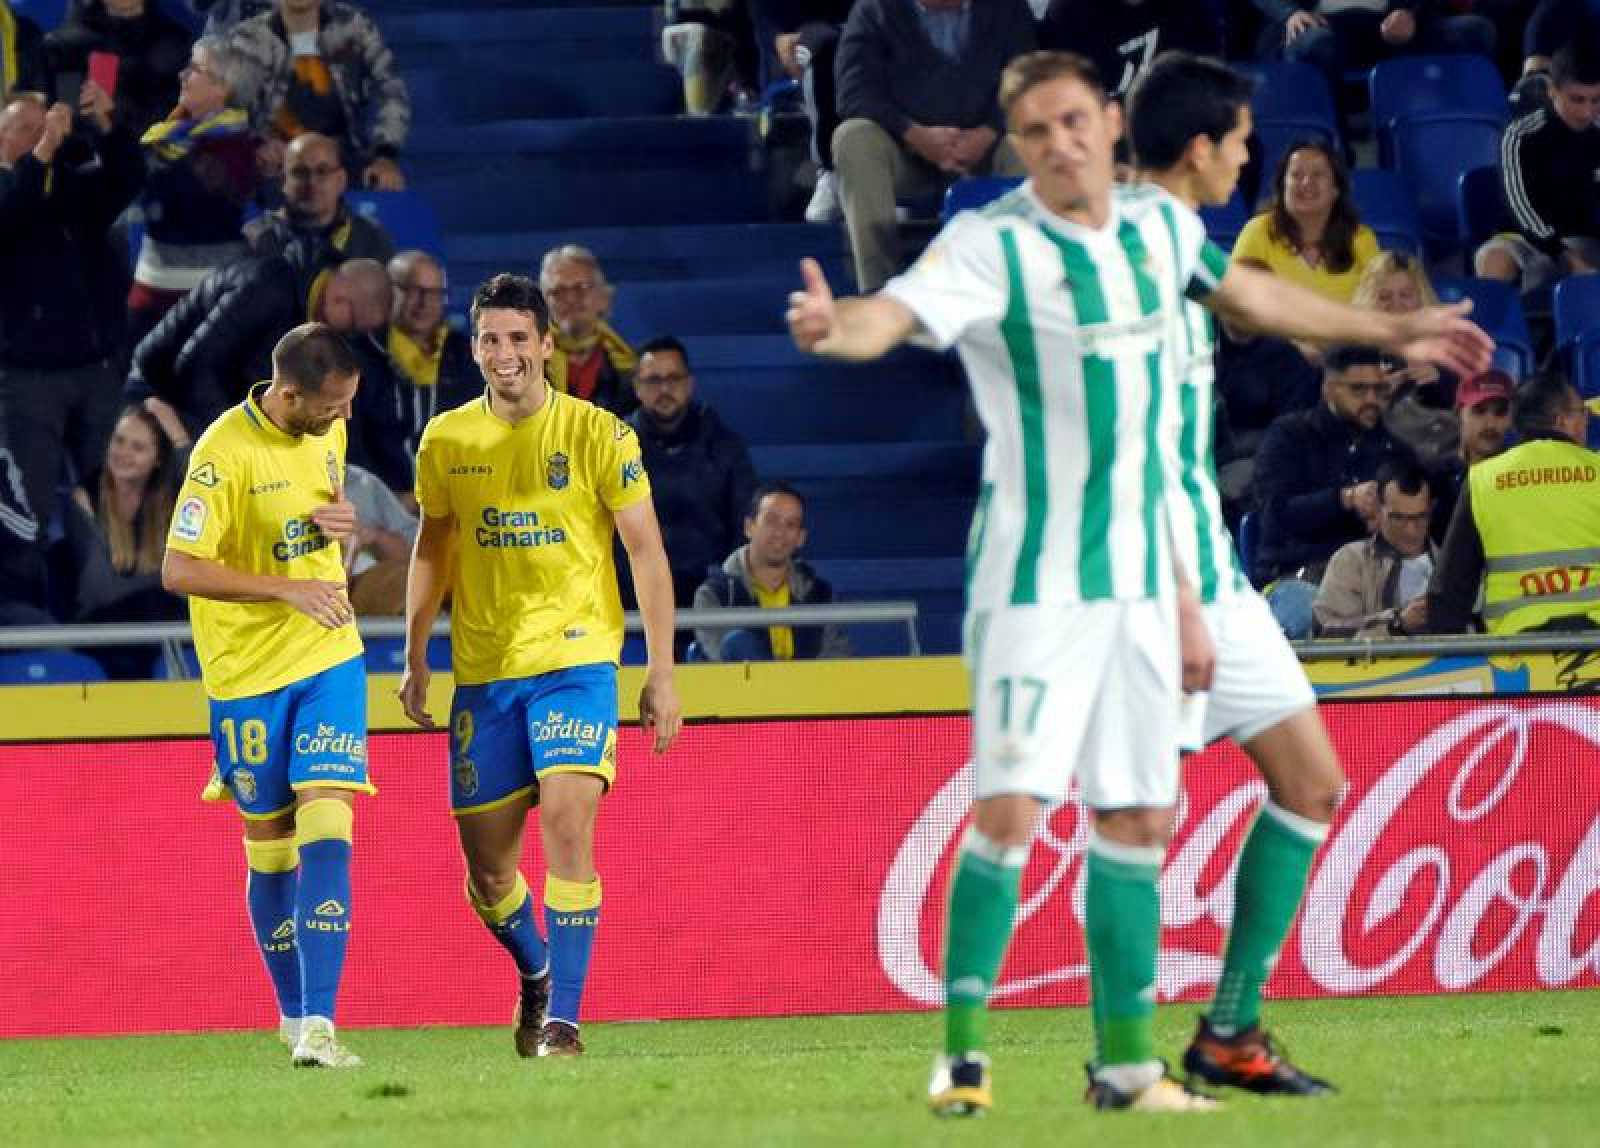 a04eff884 Las Palmas 1-0 Real Betis | Jornada 14 | Las Palmas respira a costa ...